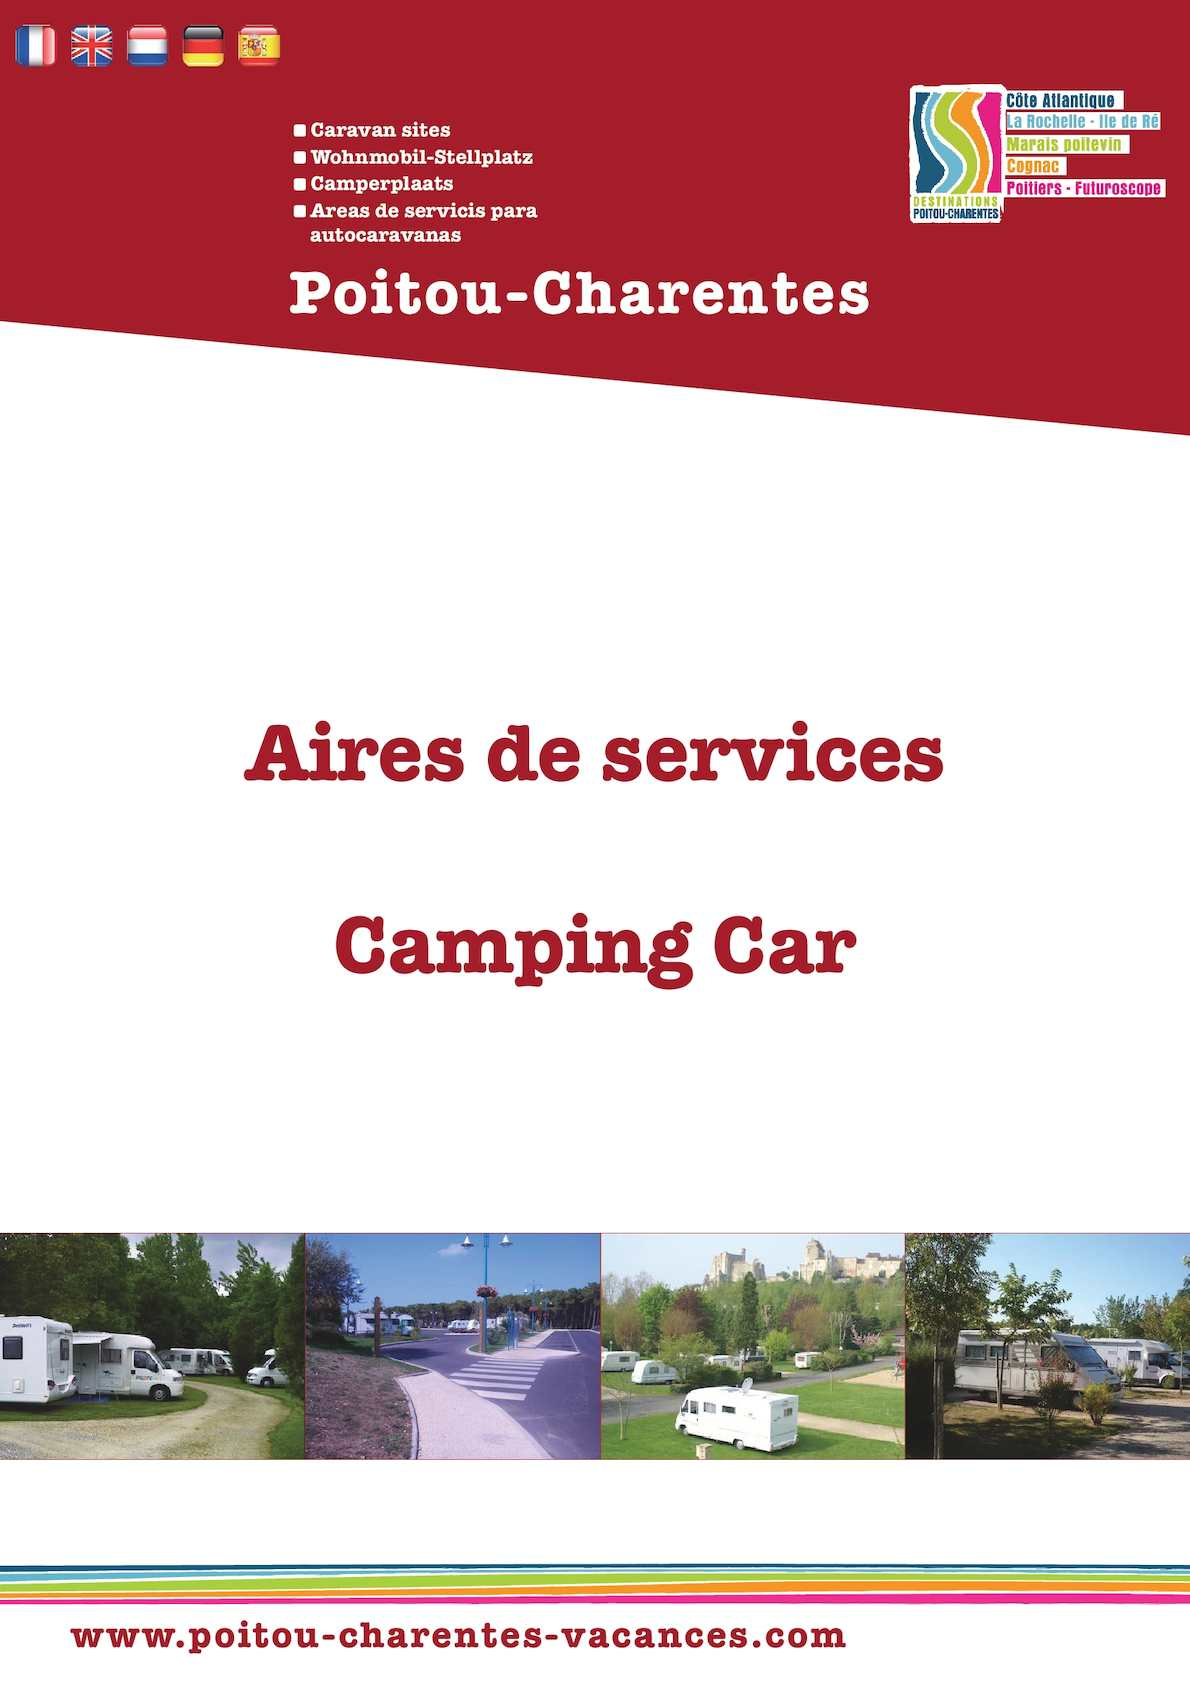 France > Poitou-Charentes > Aire de services Camping Cars > All versions (FR, GB, SP, NL, IT) > 2013